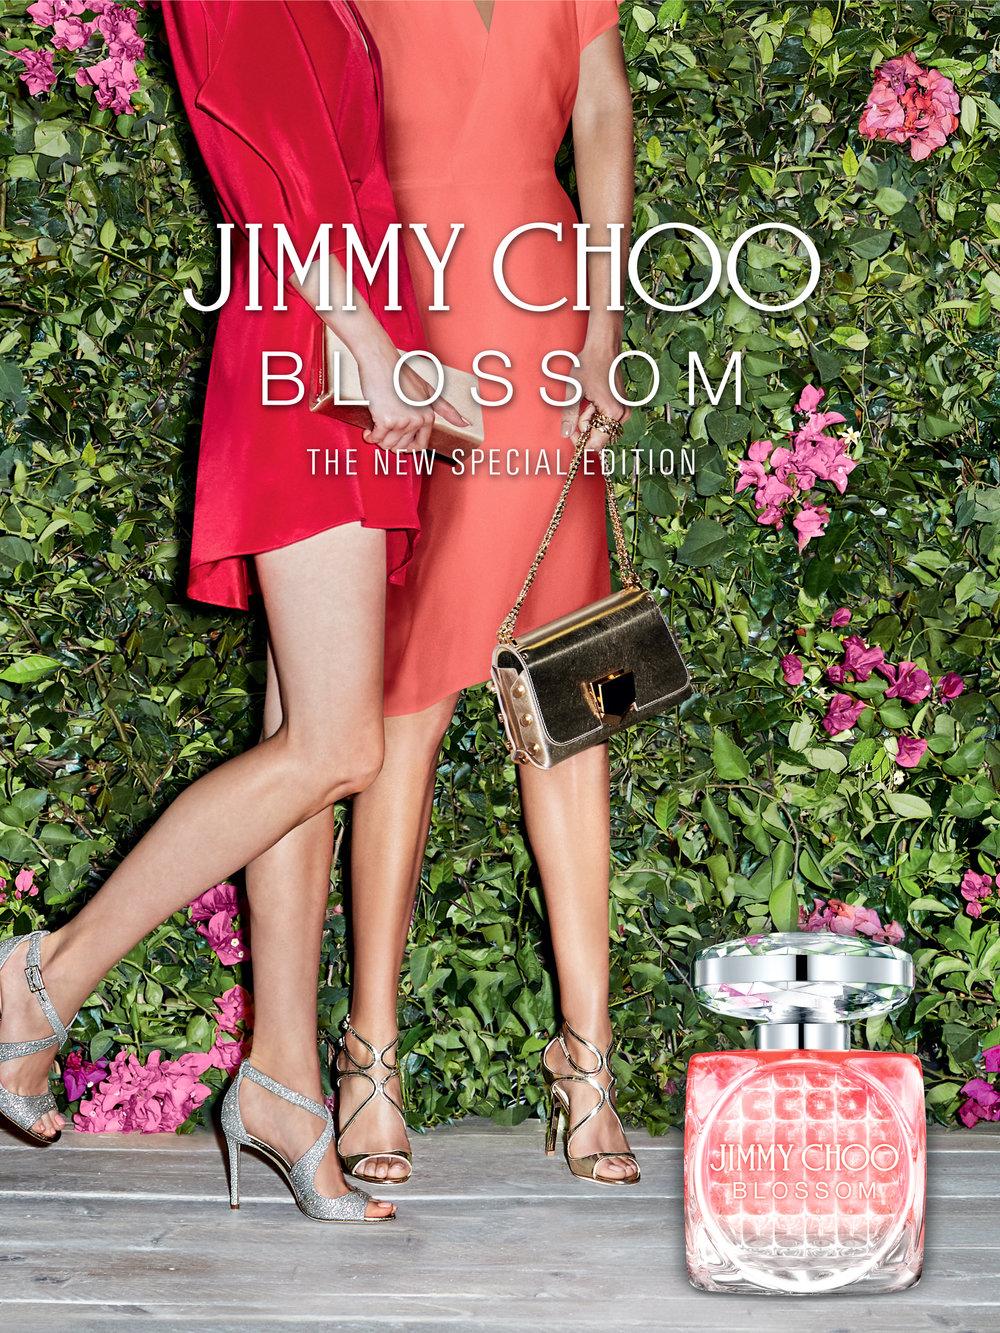 JIMMY CHOO_BLOSSOM_SPECIAL EDITION_POS_C_1.41.JPG